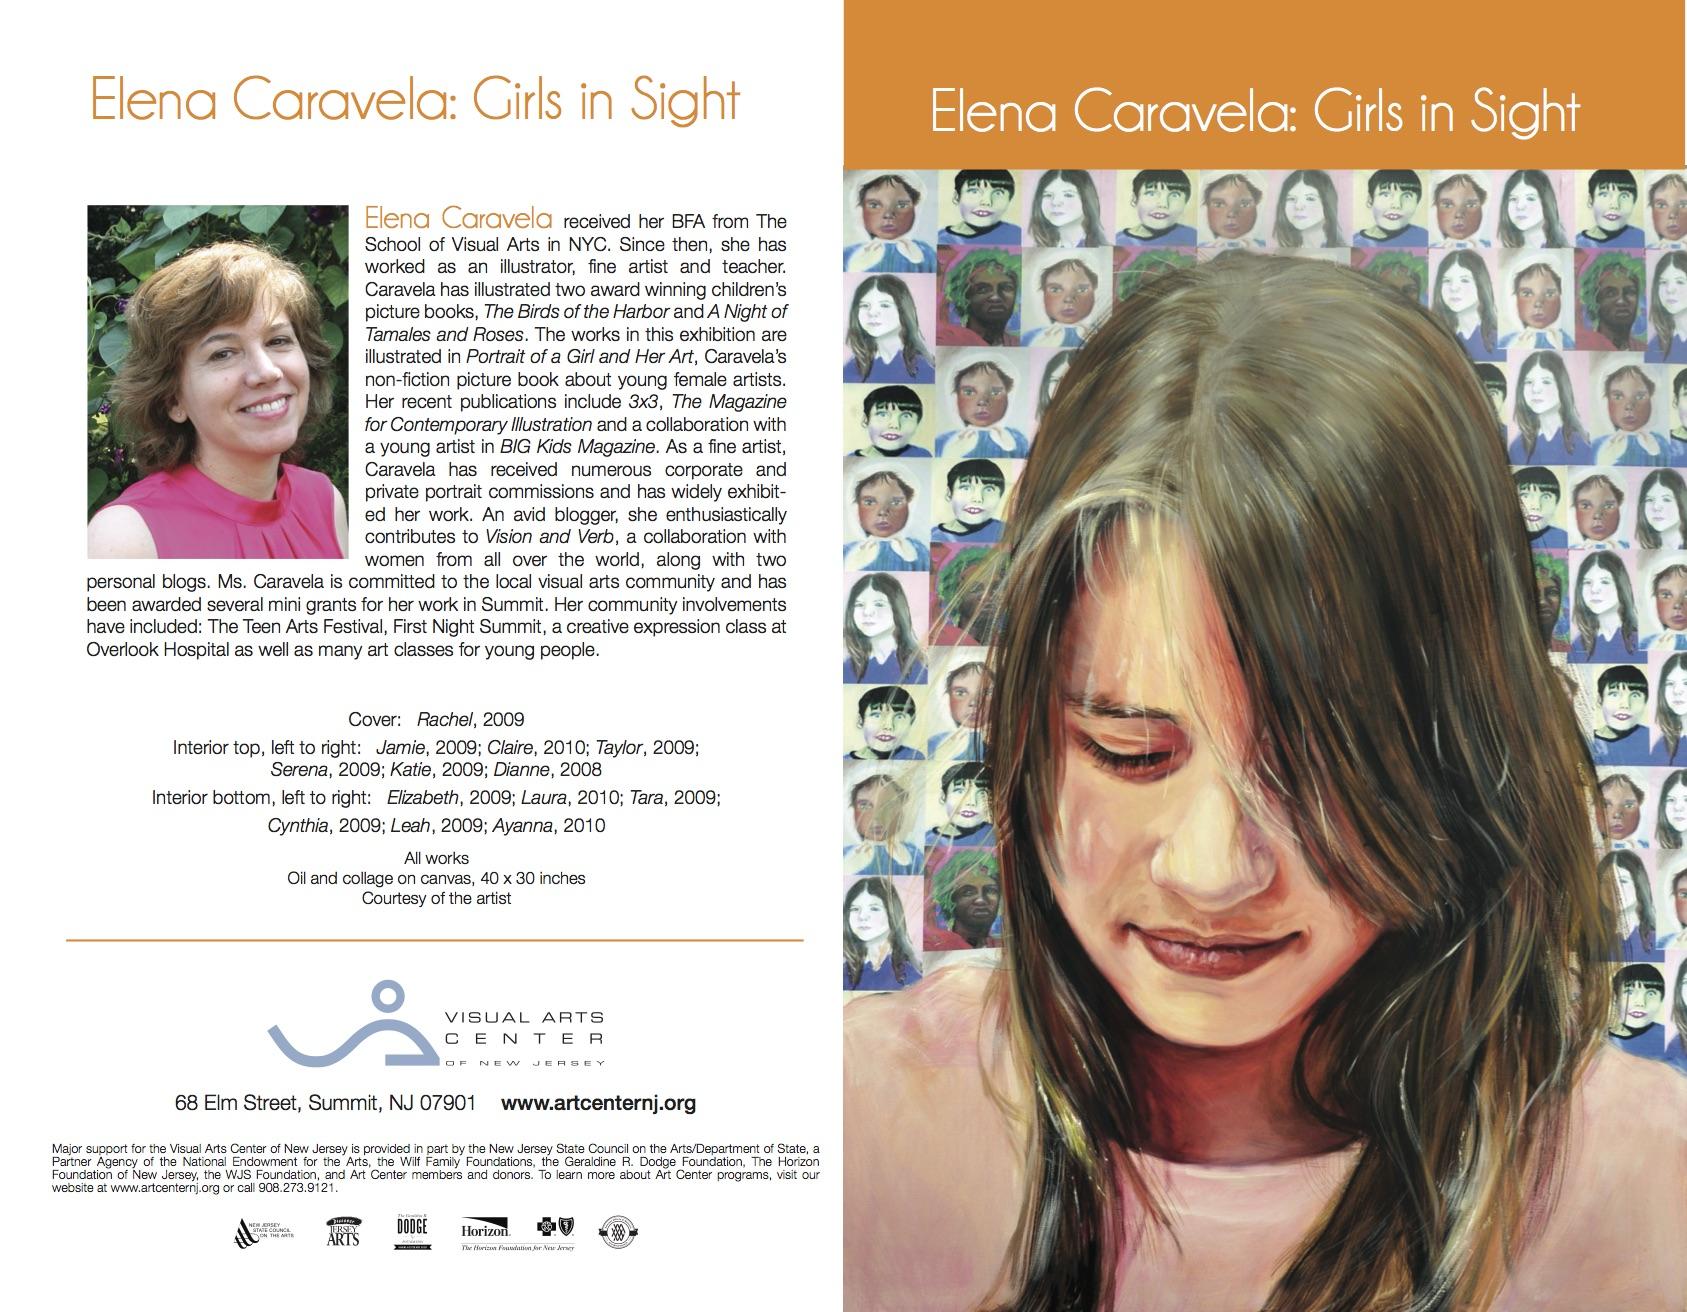 Elena Caravela: Girls in Sight, brochure (outside)